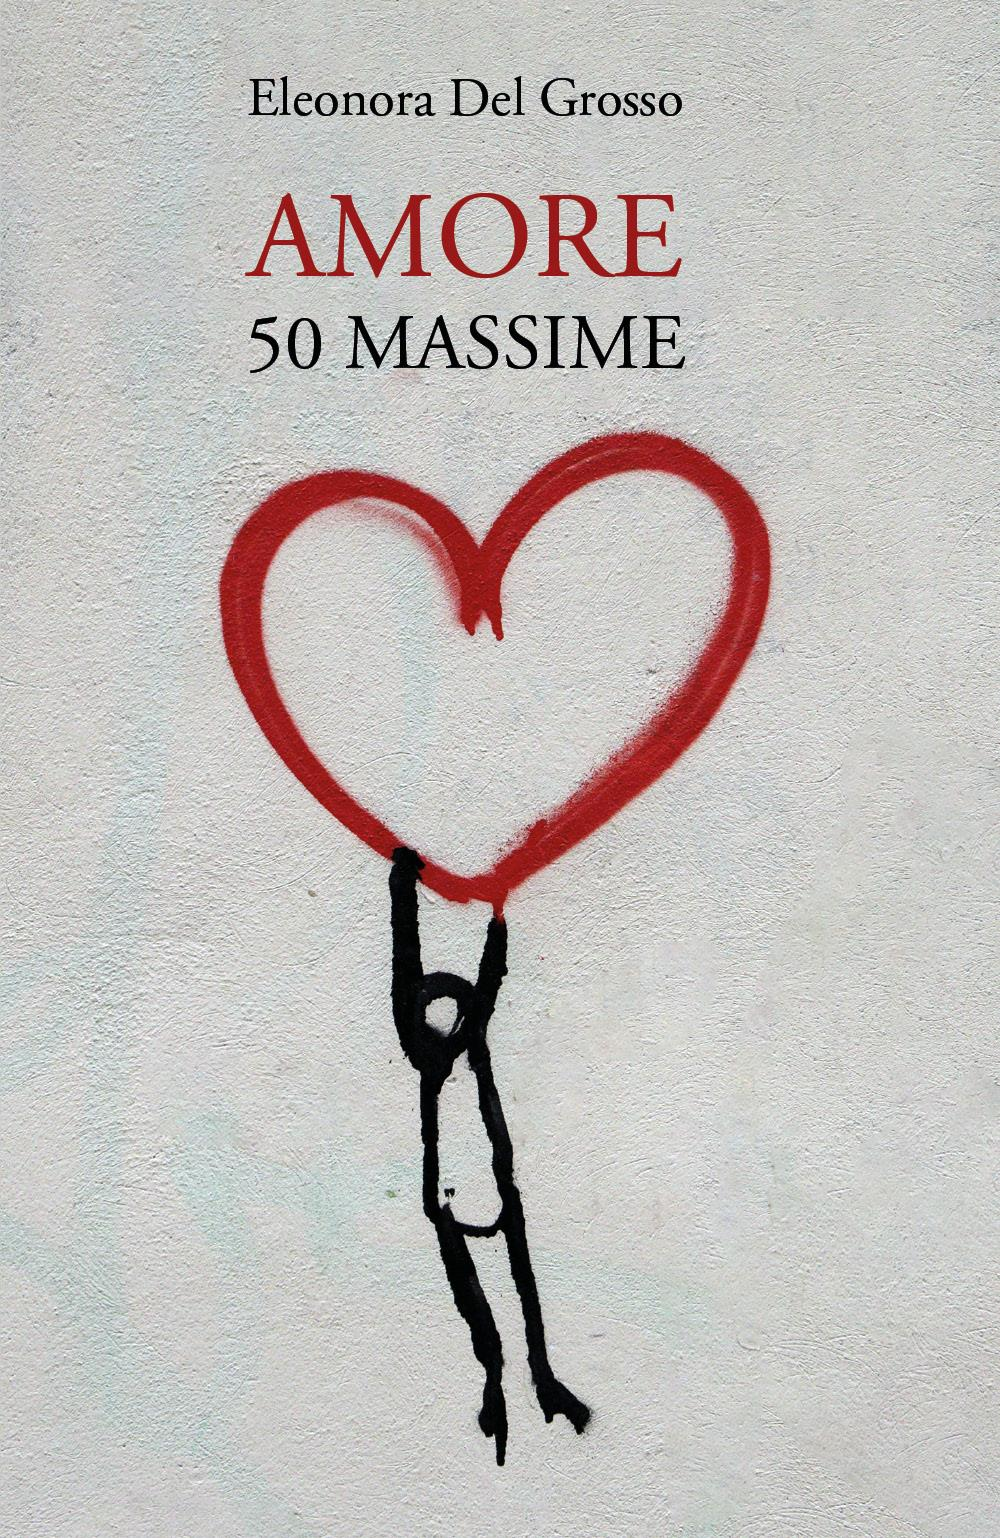 Amore. 50 Massime